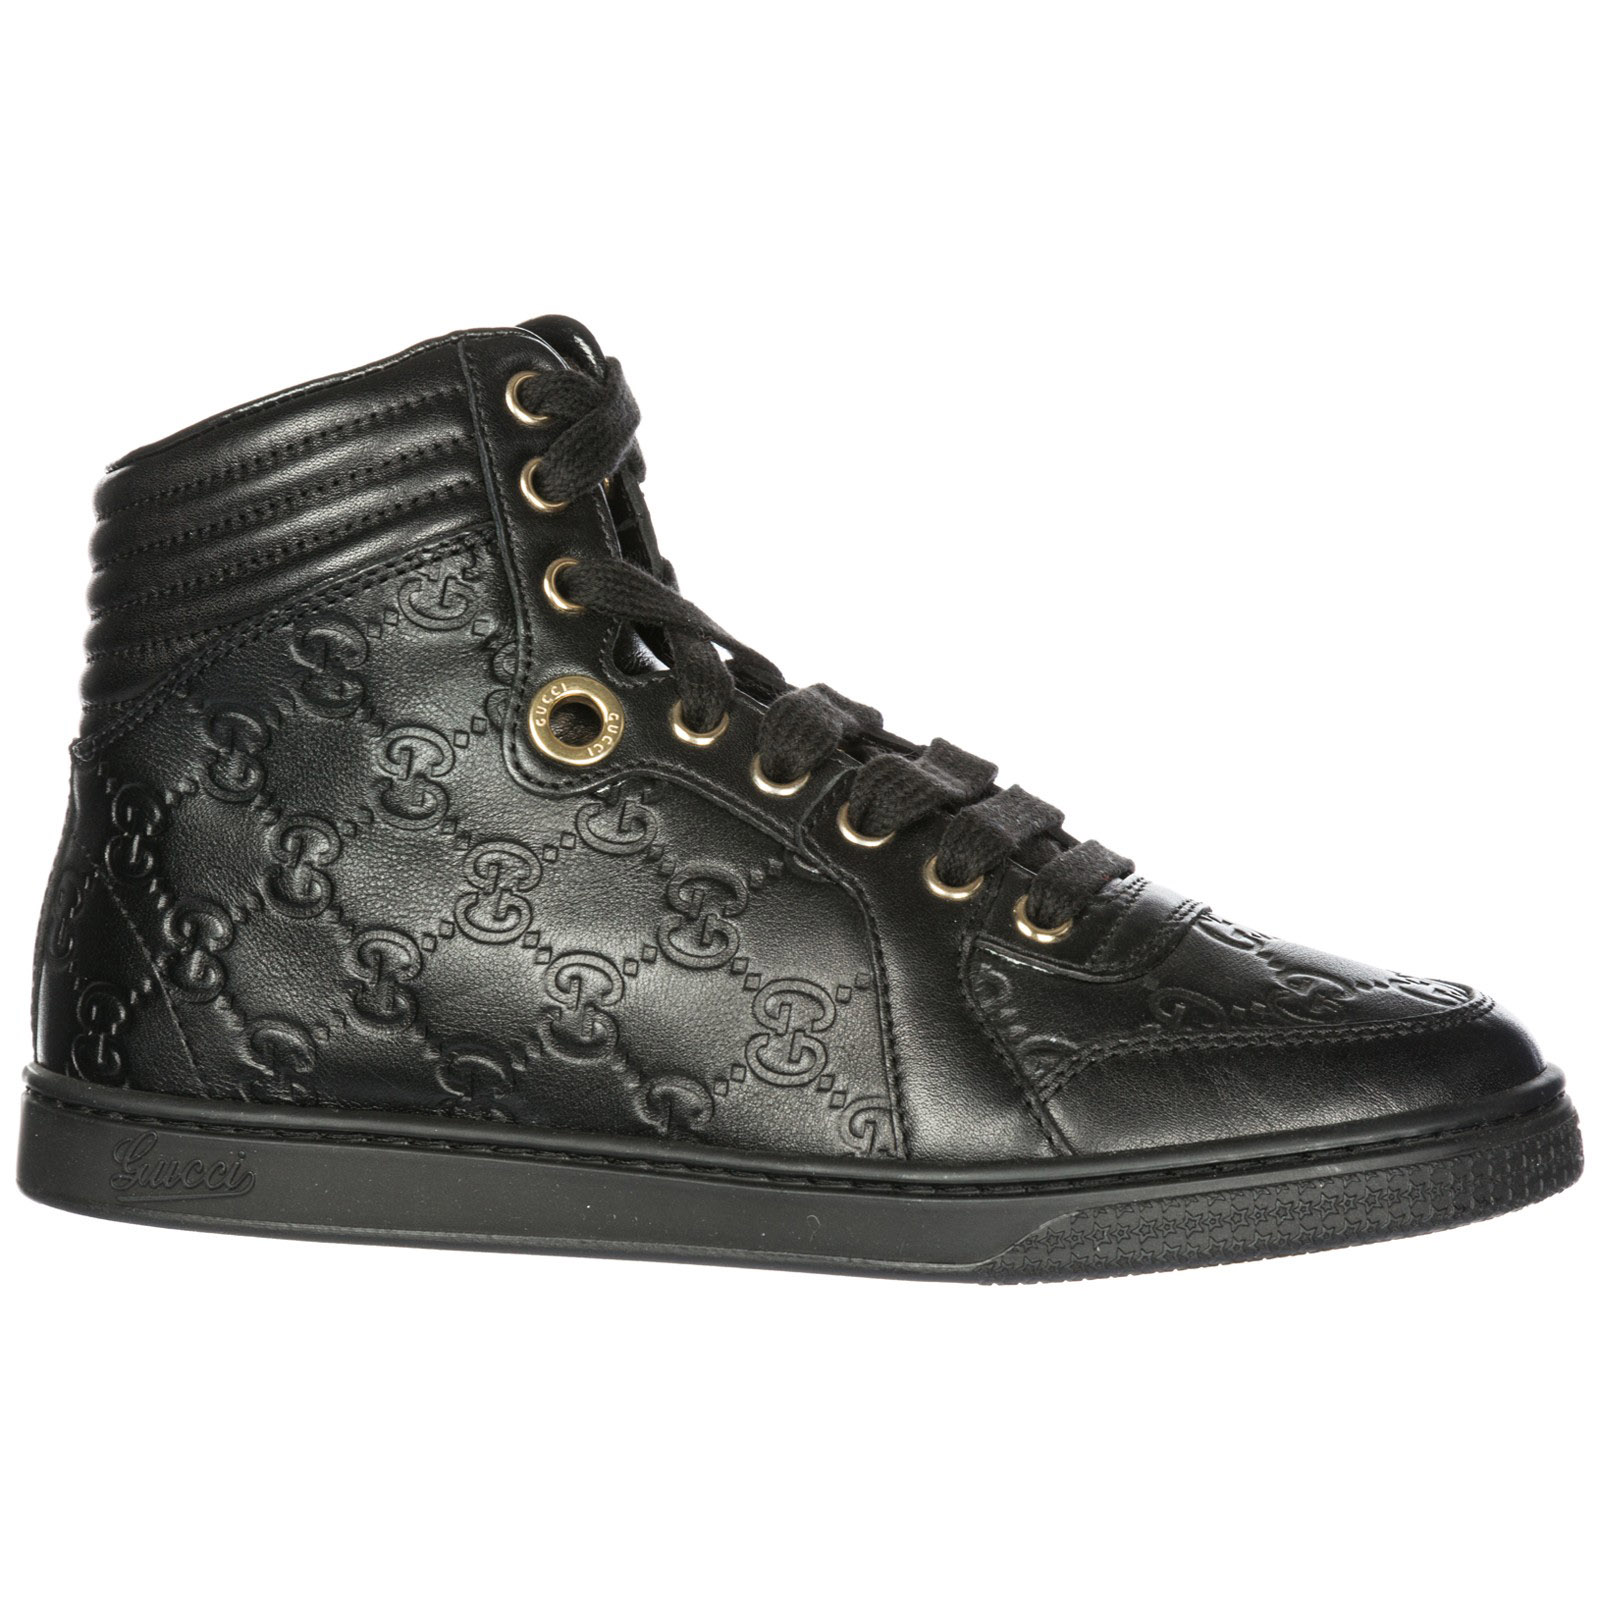 ... Scarpe sneakers alte donna in pelle ... 8b3113afa604